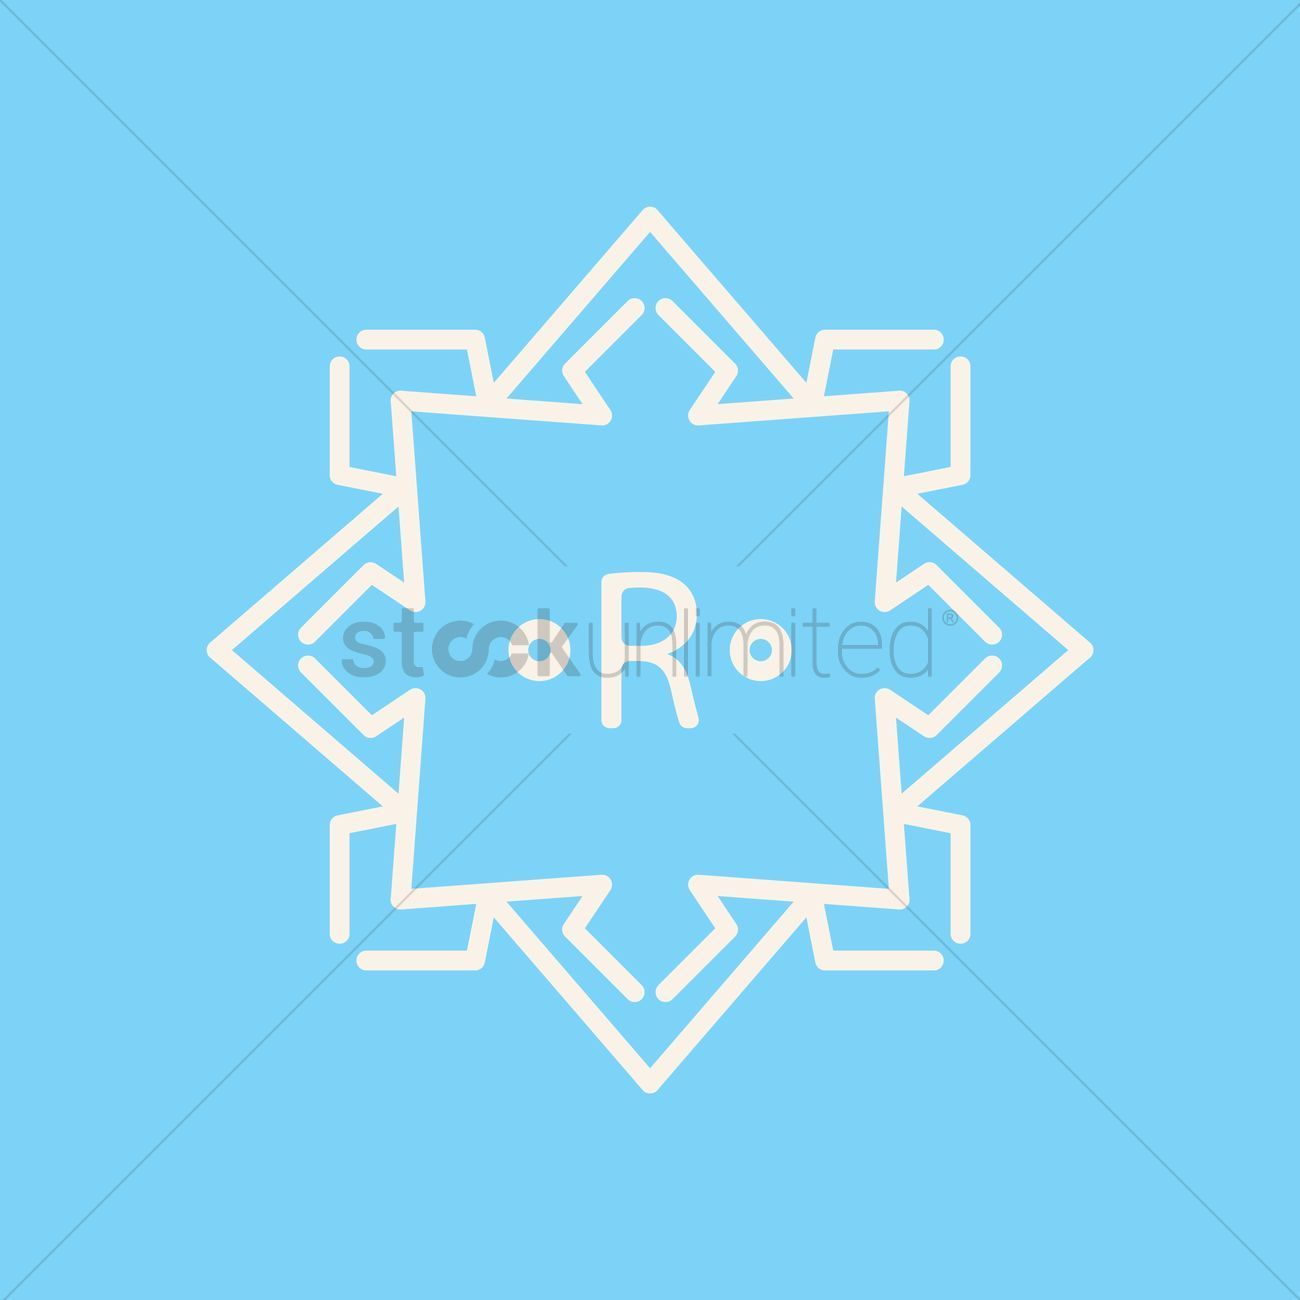 ornament design element stock vector Symmetrical ornament design element stock vector